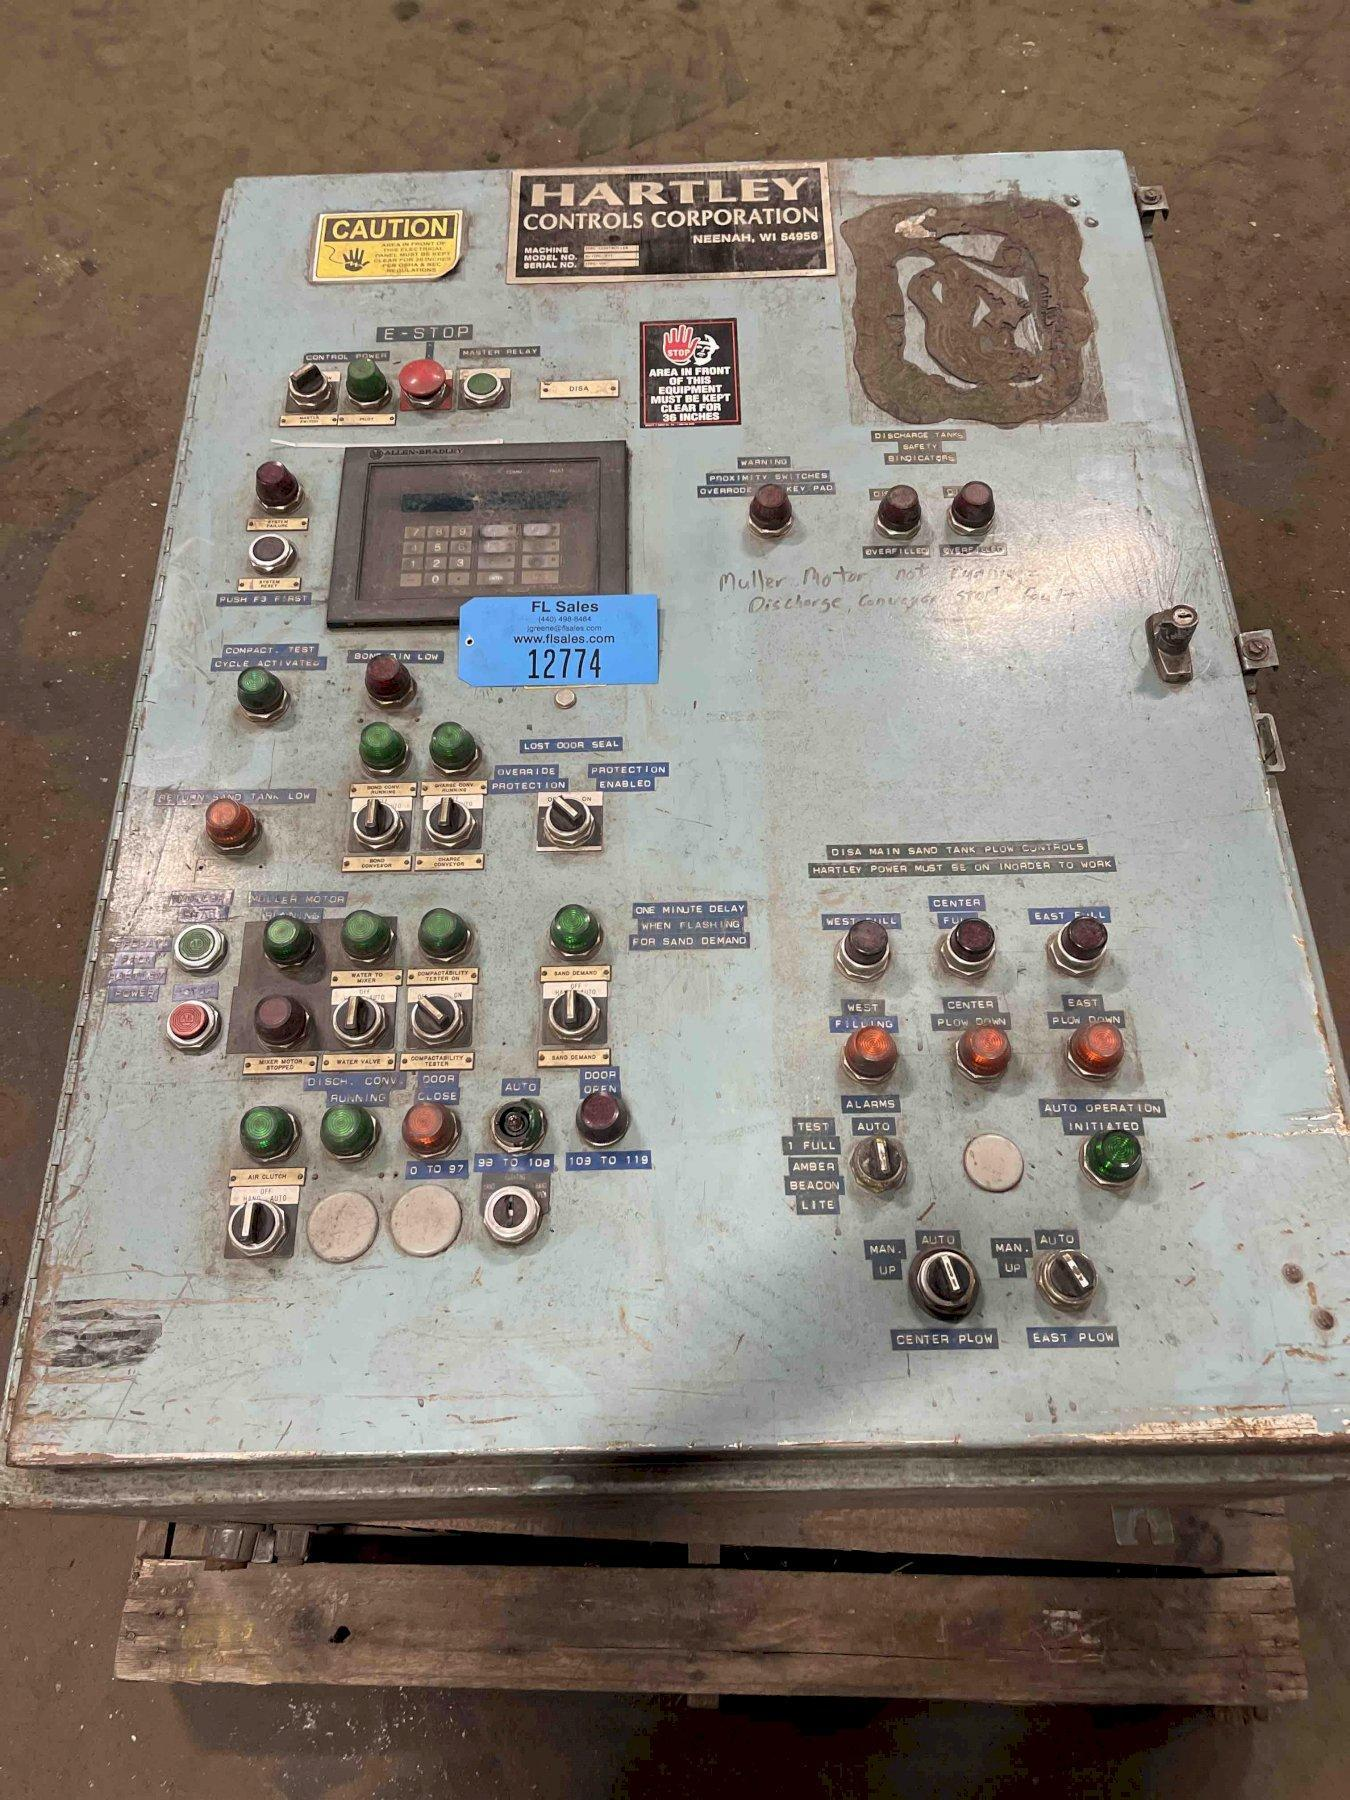 HARTLEY 17PC COMPACTABILITY CONTROLS WITH ALLEN-BRADLEY PLC 5/15 S/N 17pc-119